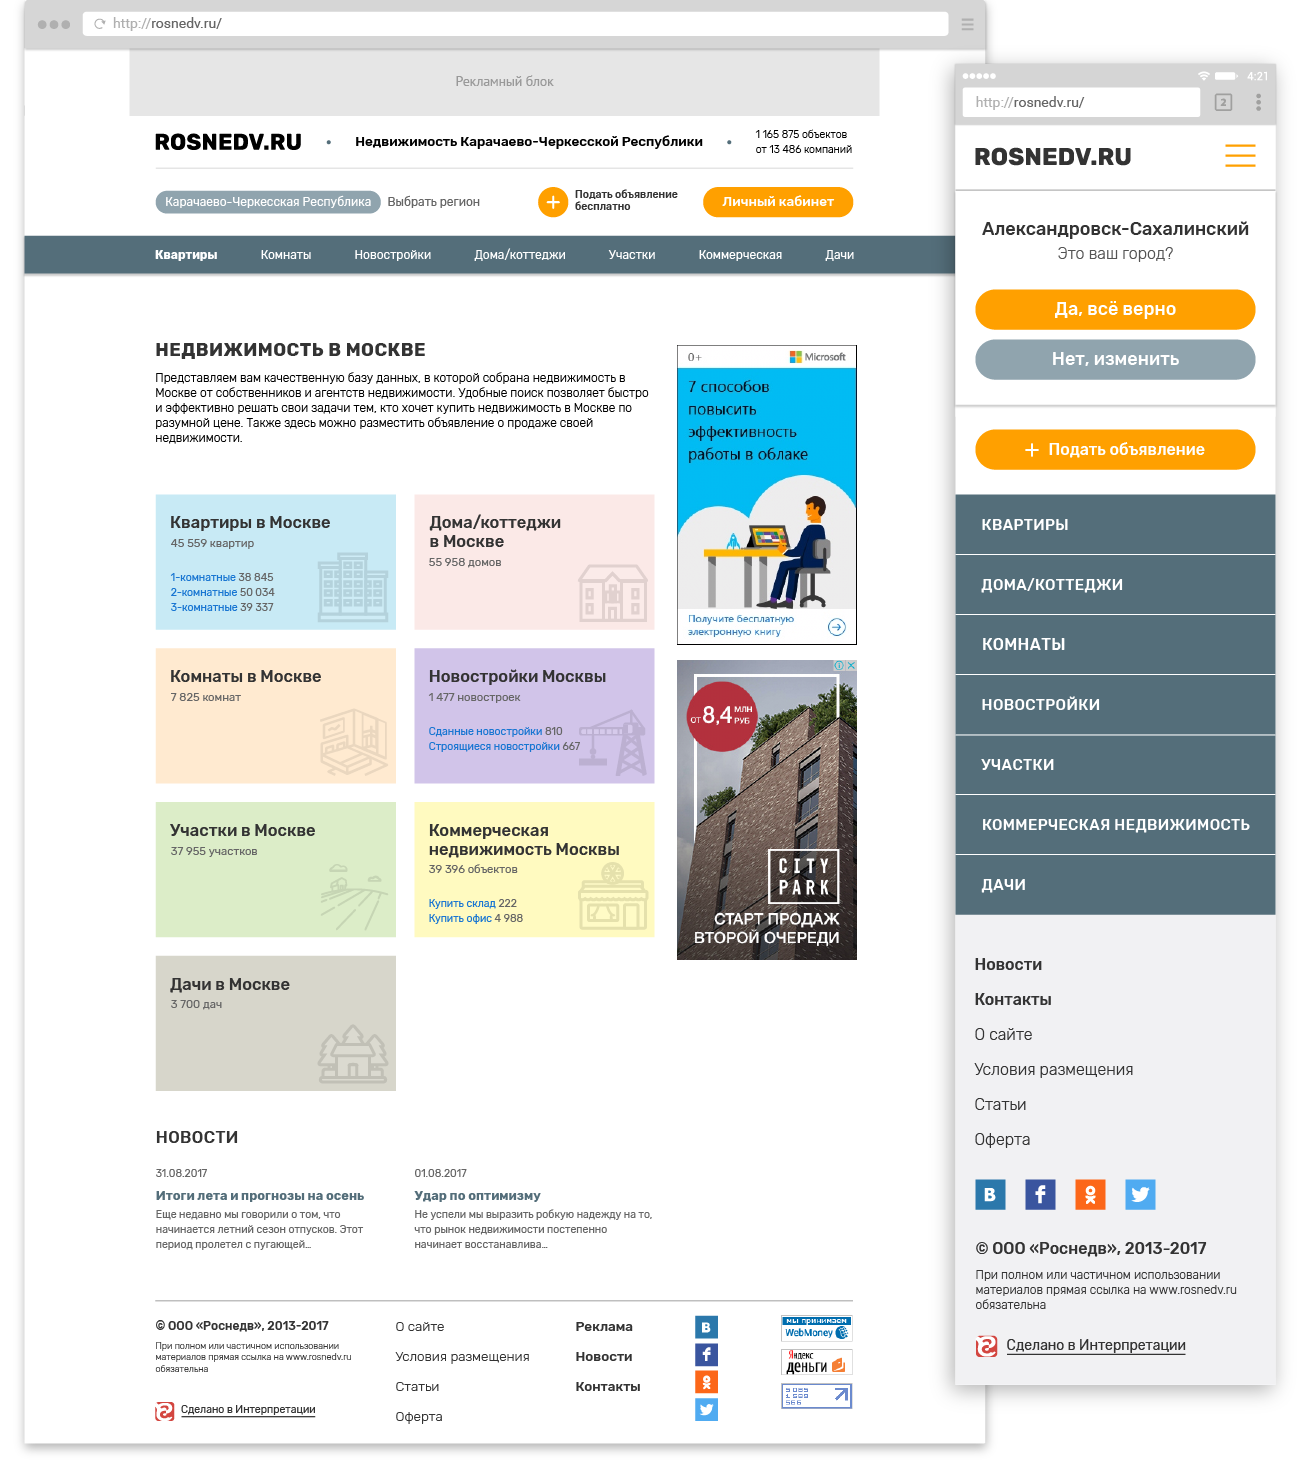 Главная страница сервиса rosnedv.ru.